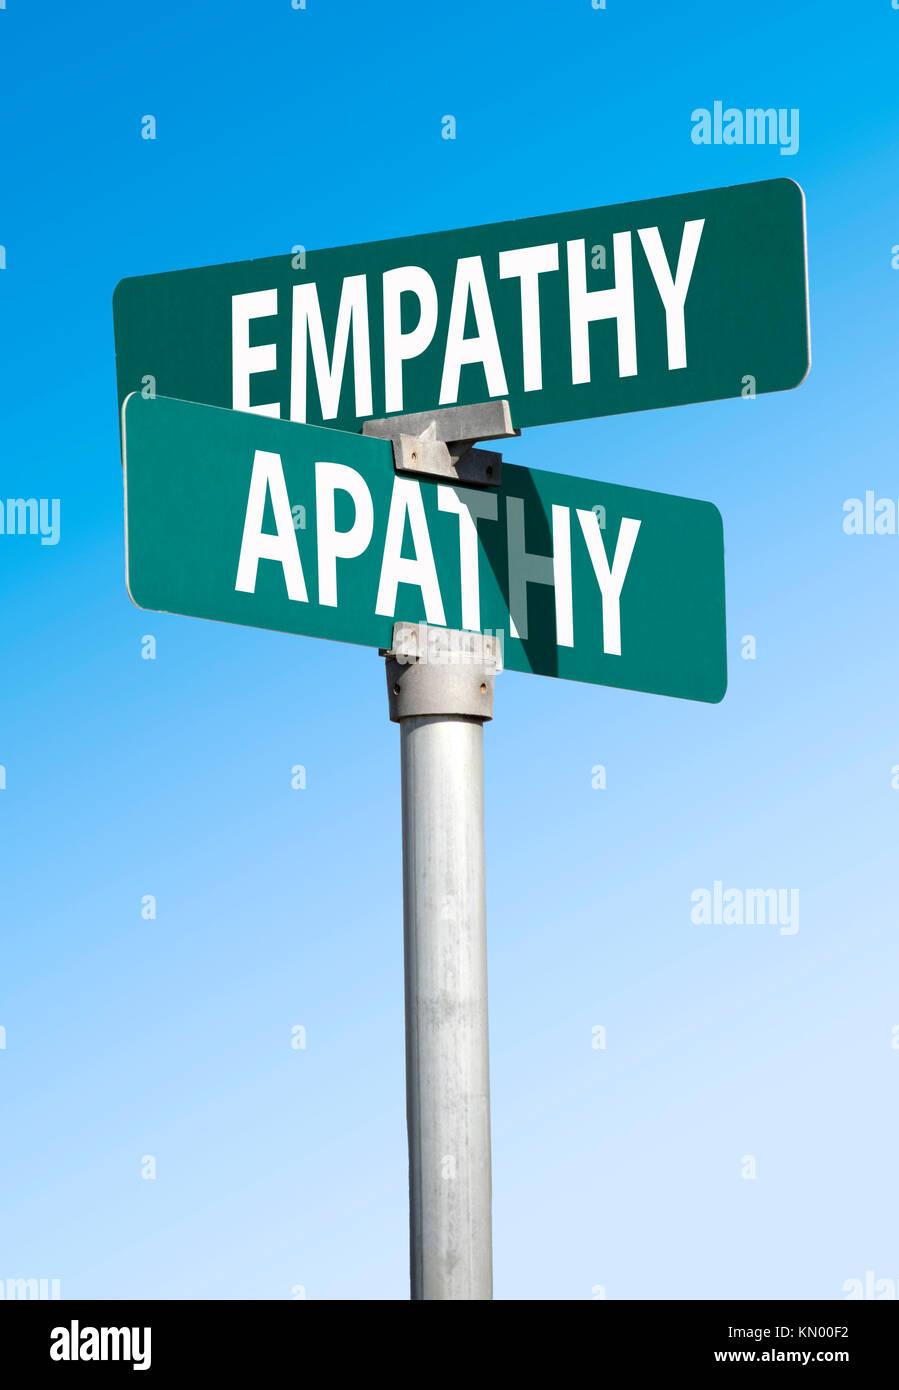 empathy and apathy sign - Stock Image